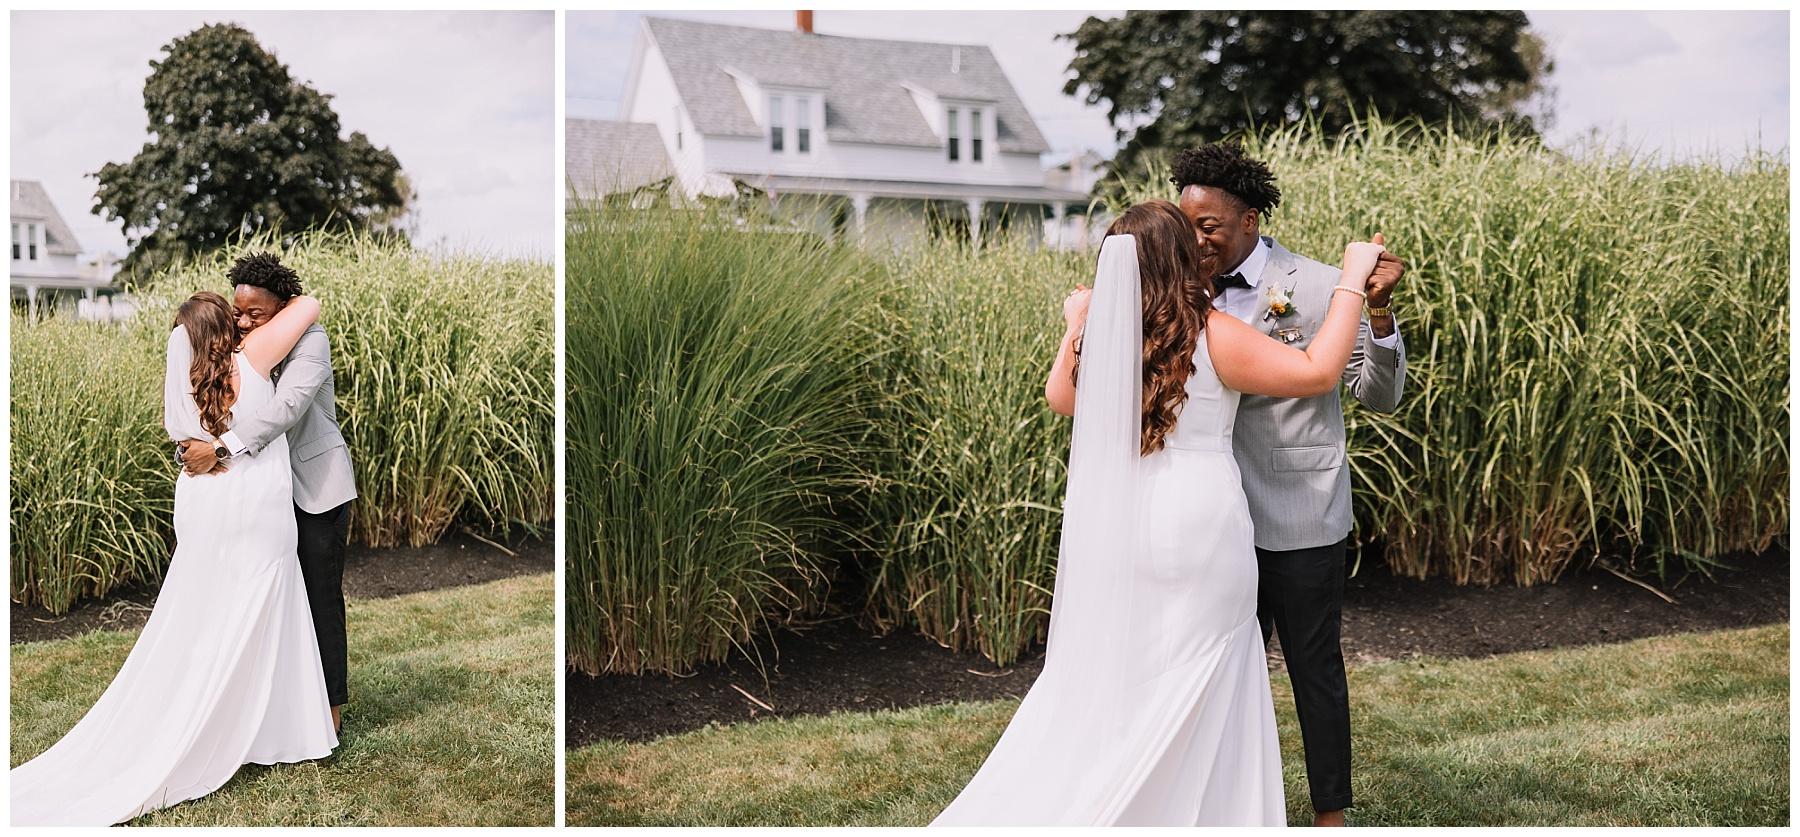 Union Bluff, York Maine Wedding